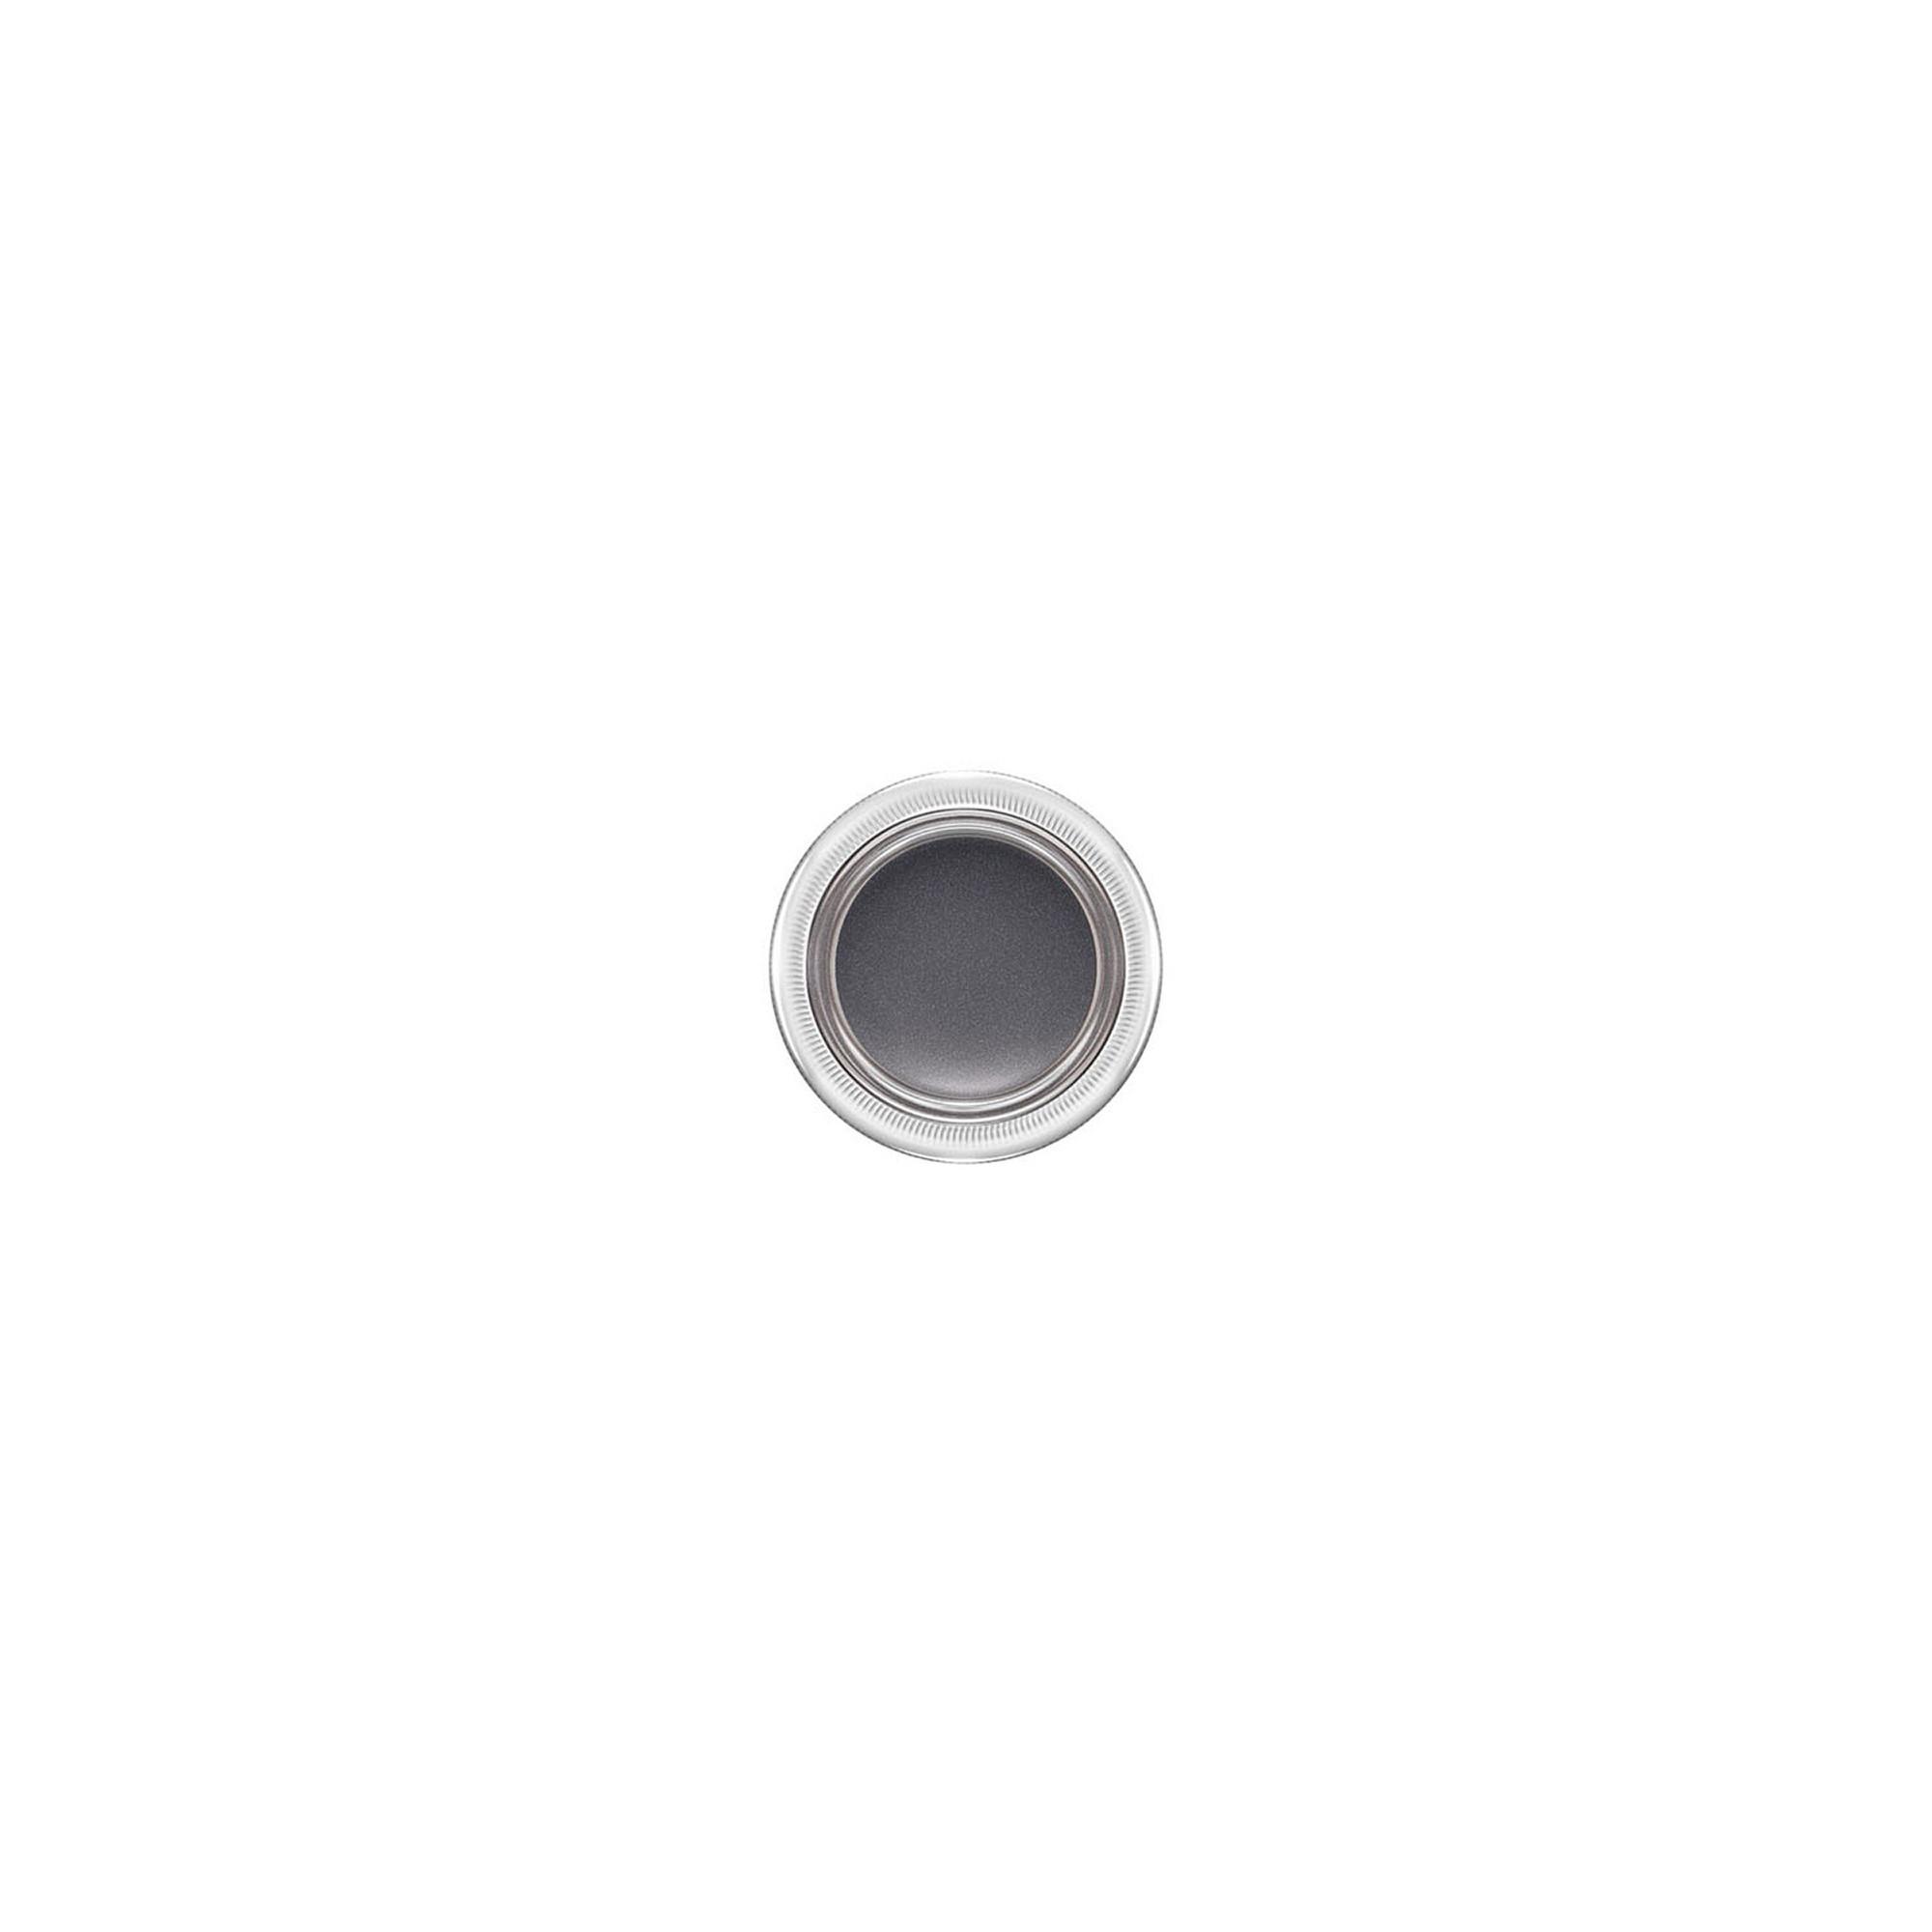 Pro Longwear Fluidline Eye Liner Gel - Midnight Snack, MIDNIGHT SNACK, large image number 0